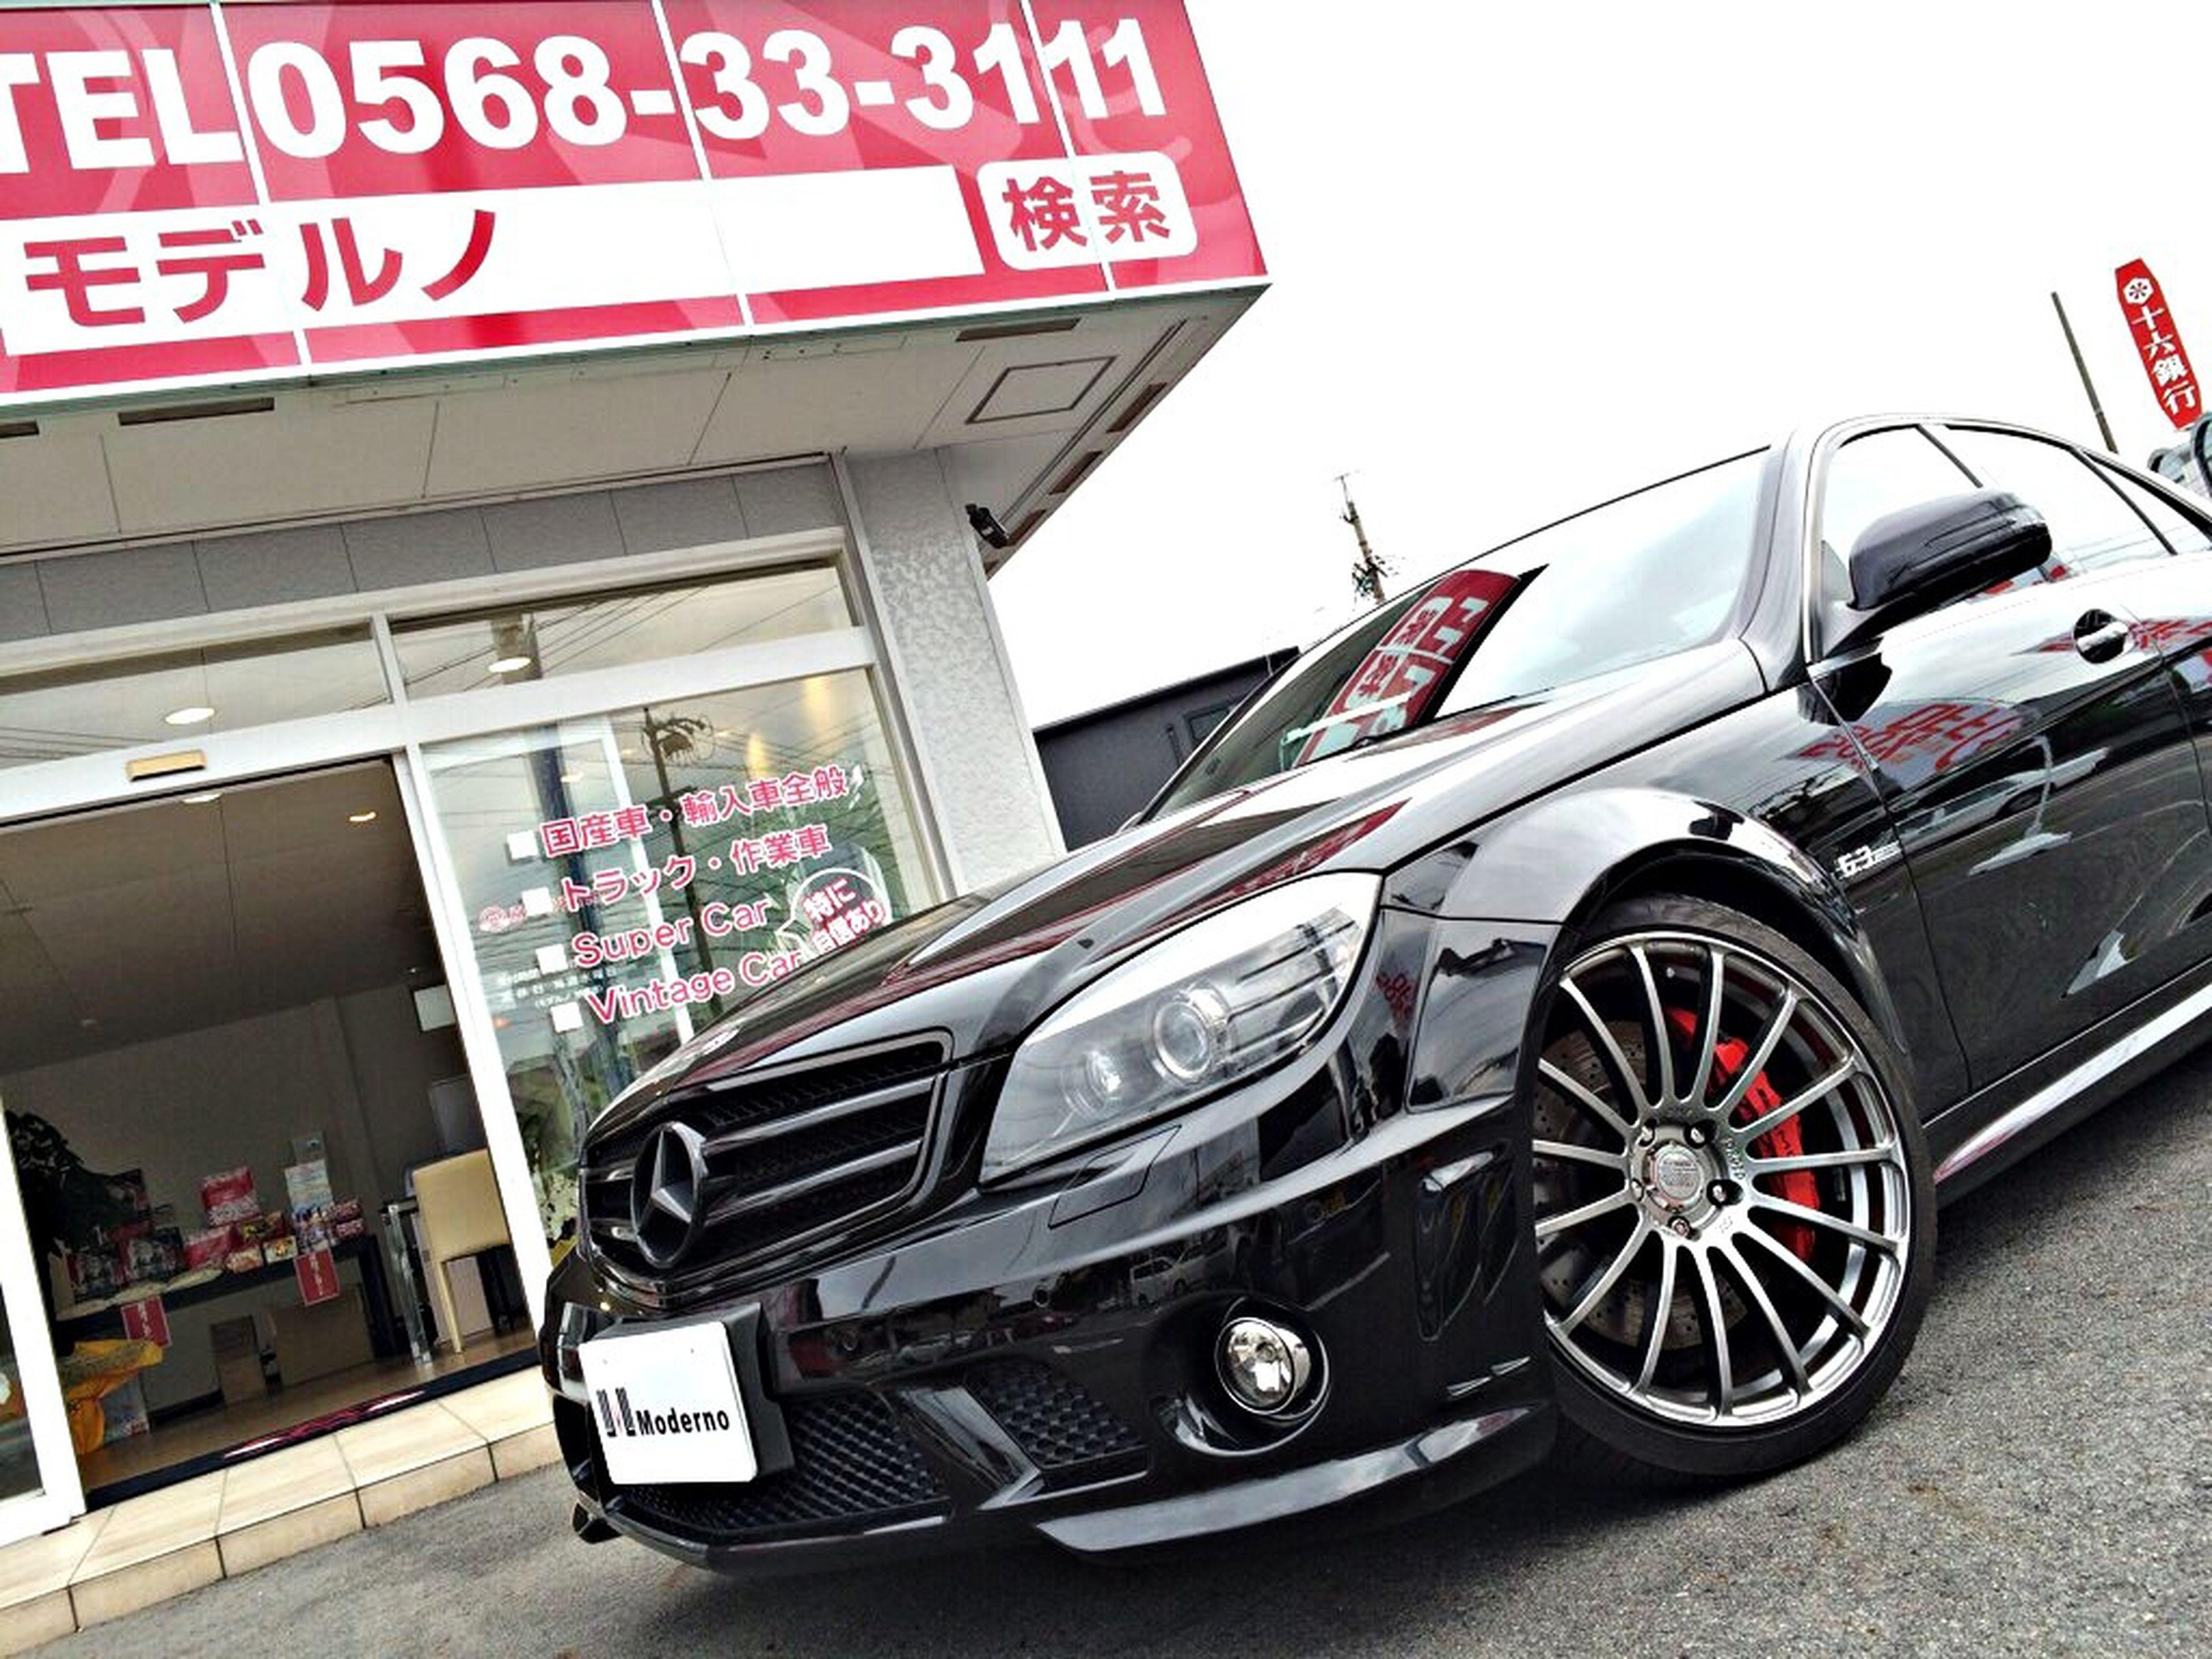 C63入荷です୧(`•ω•´)୨ Car 車 Sale Enjoying Life